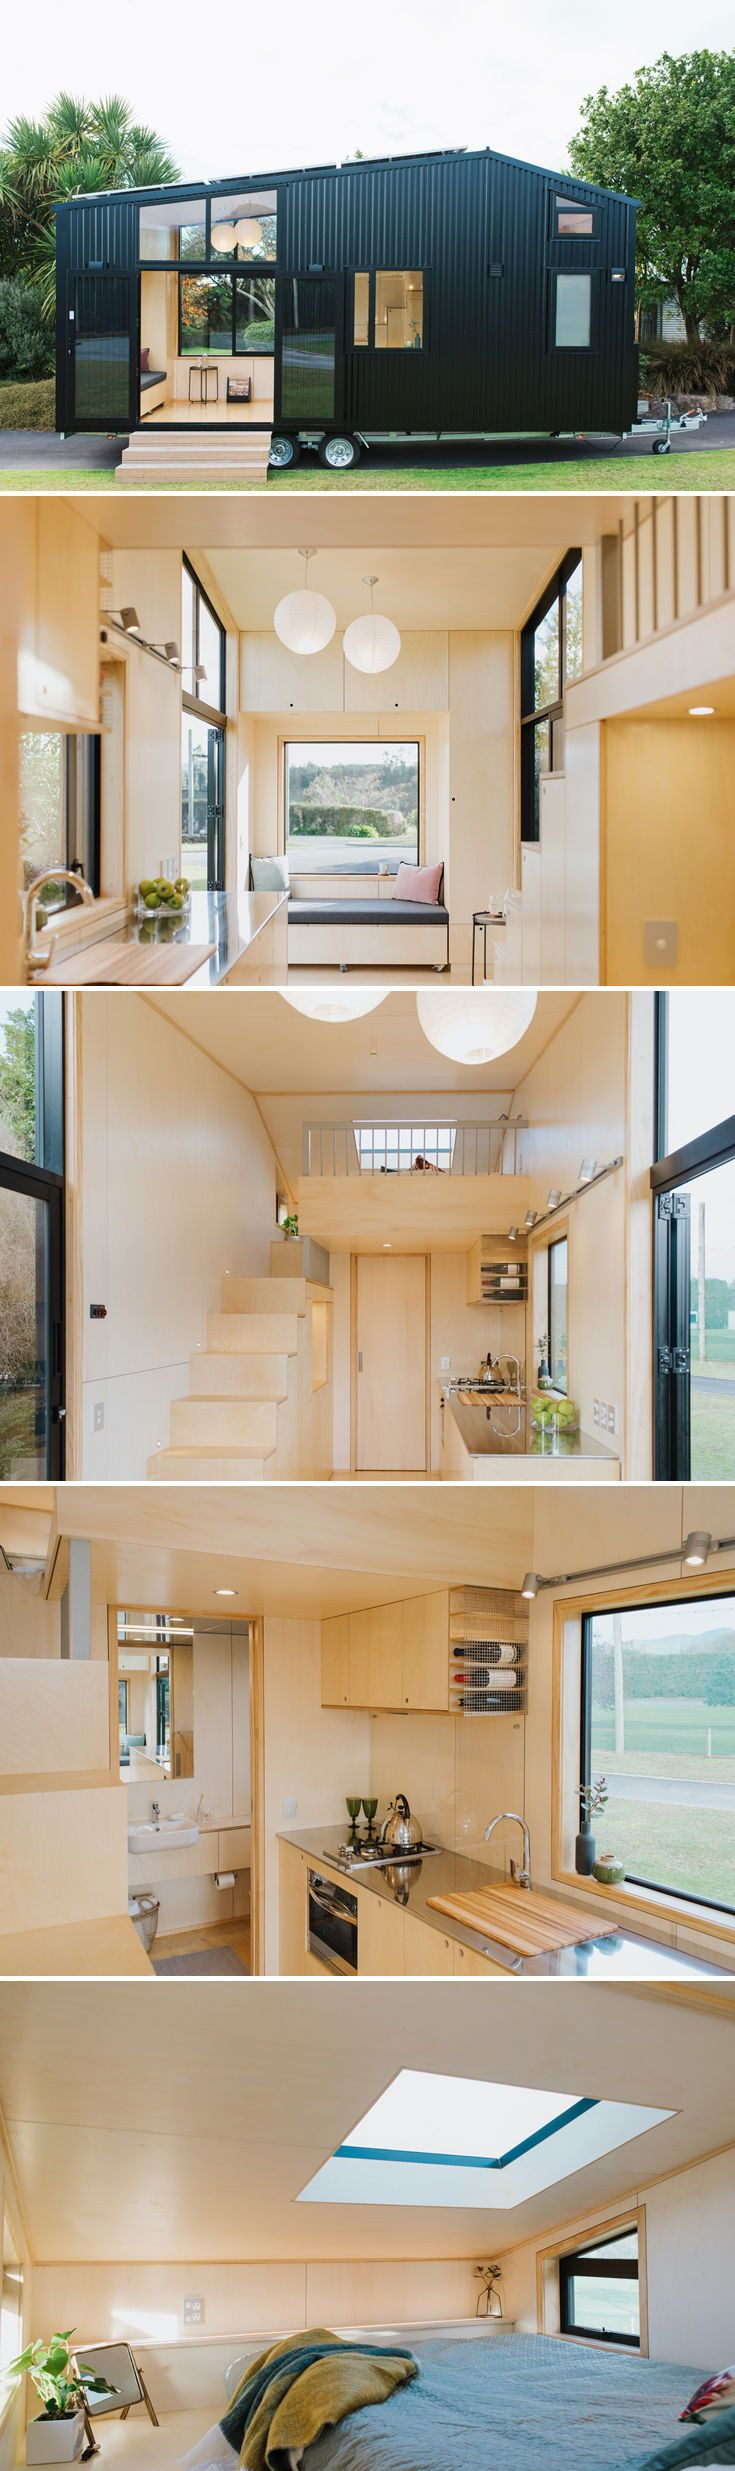 First Light Tiny House by Build Tiny